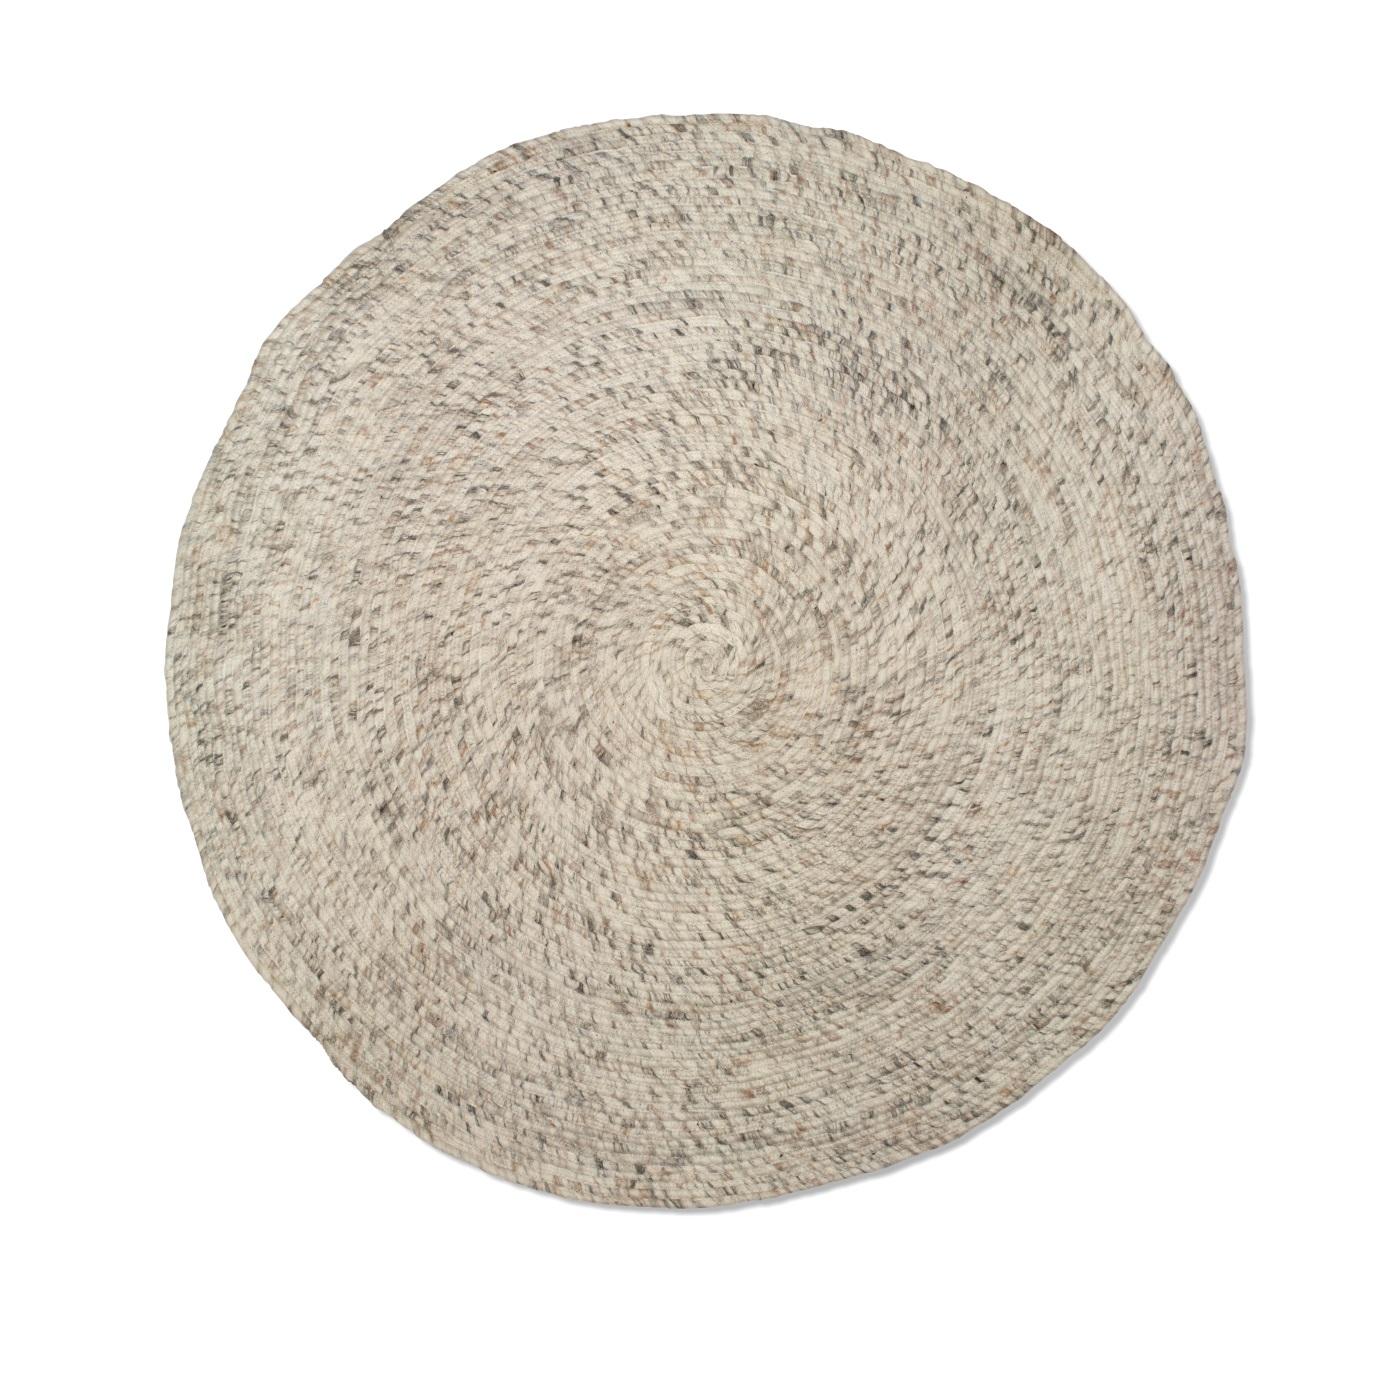 Rund ullmatta Merino beige 200 cm, Classic Collection